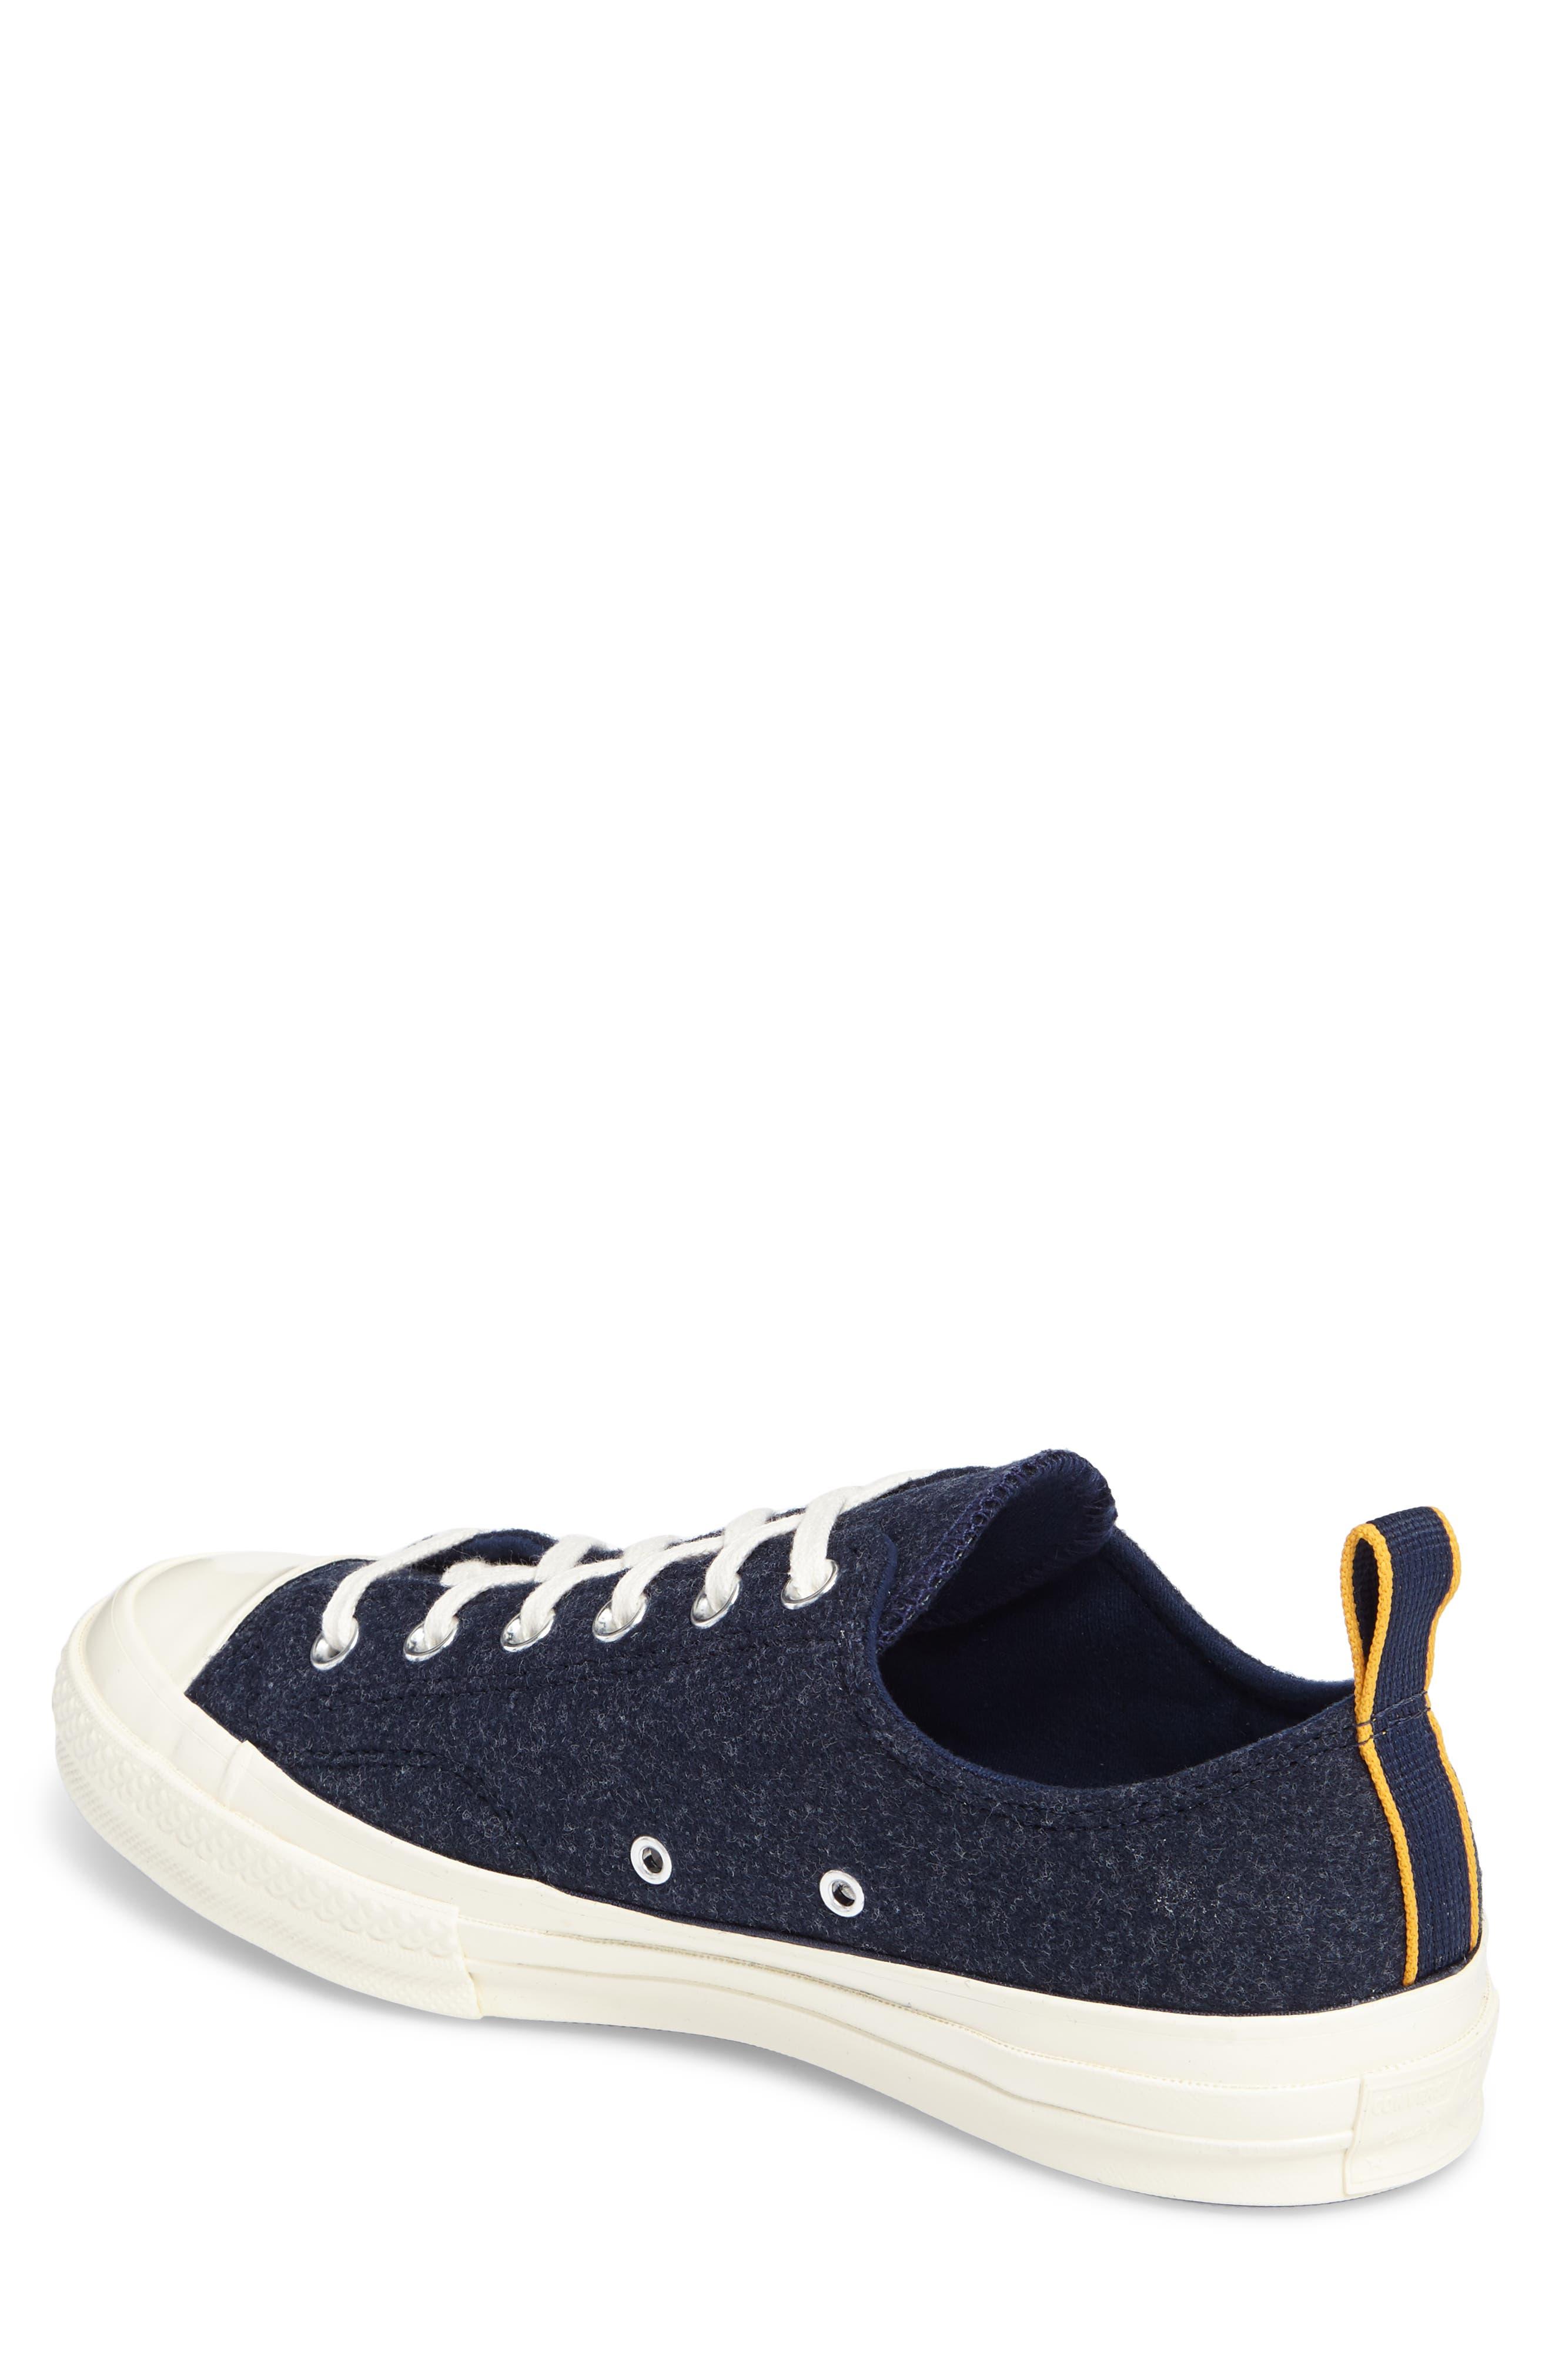 Alternate Image 2  - Converse Chuck Taylor® 70 Heritage Sneaker (Men)